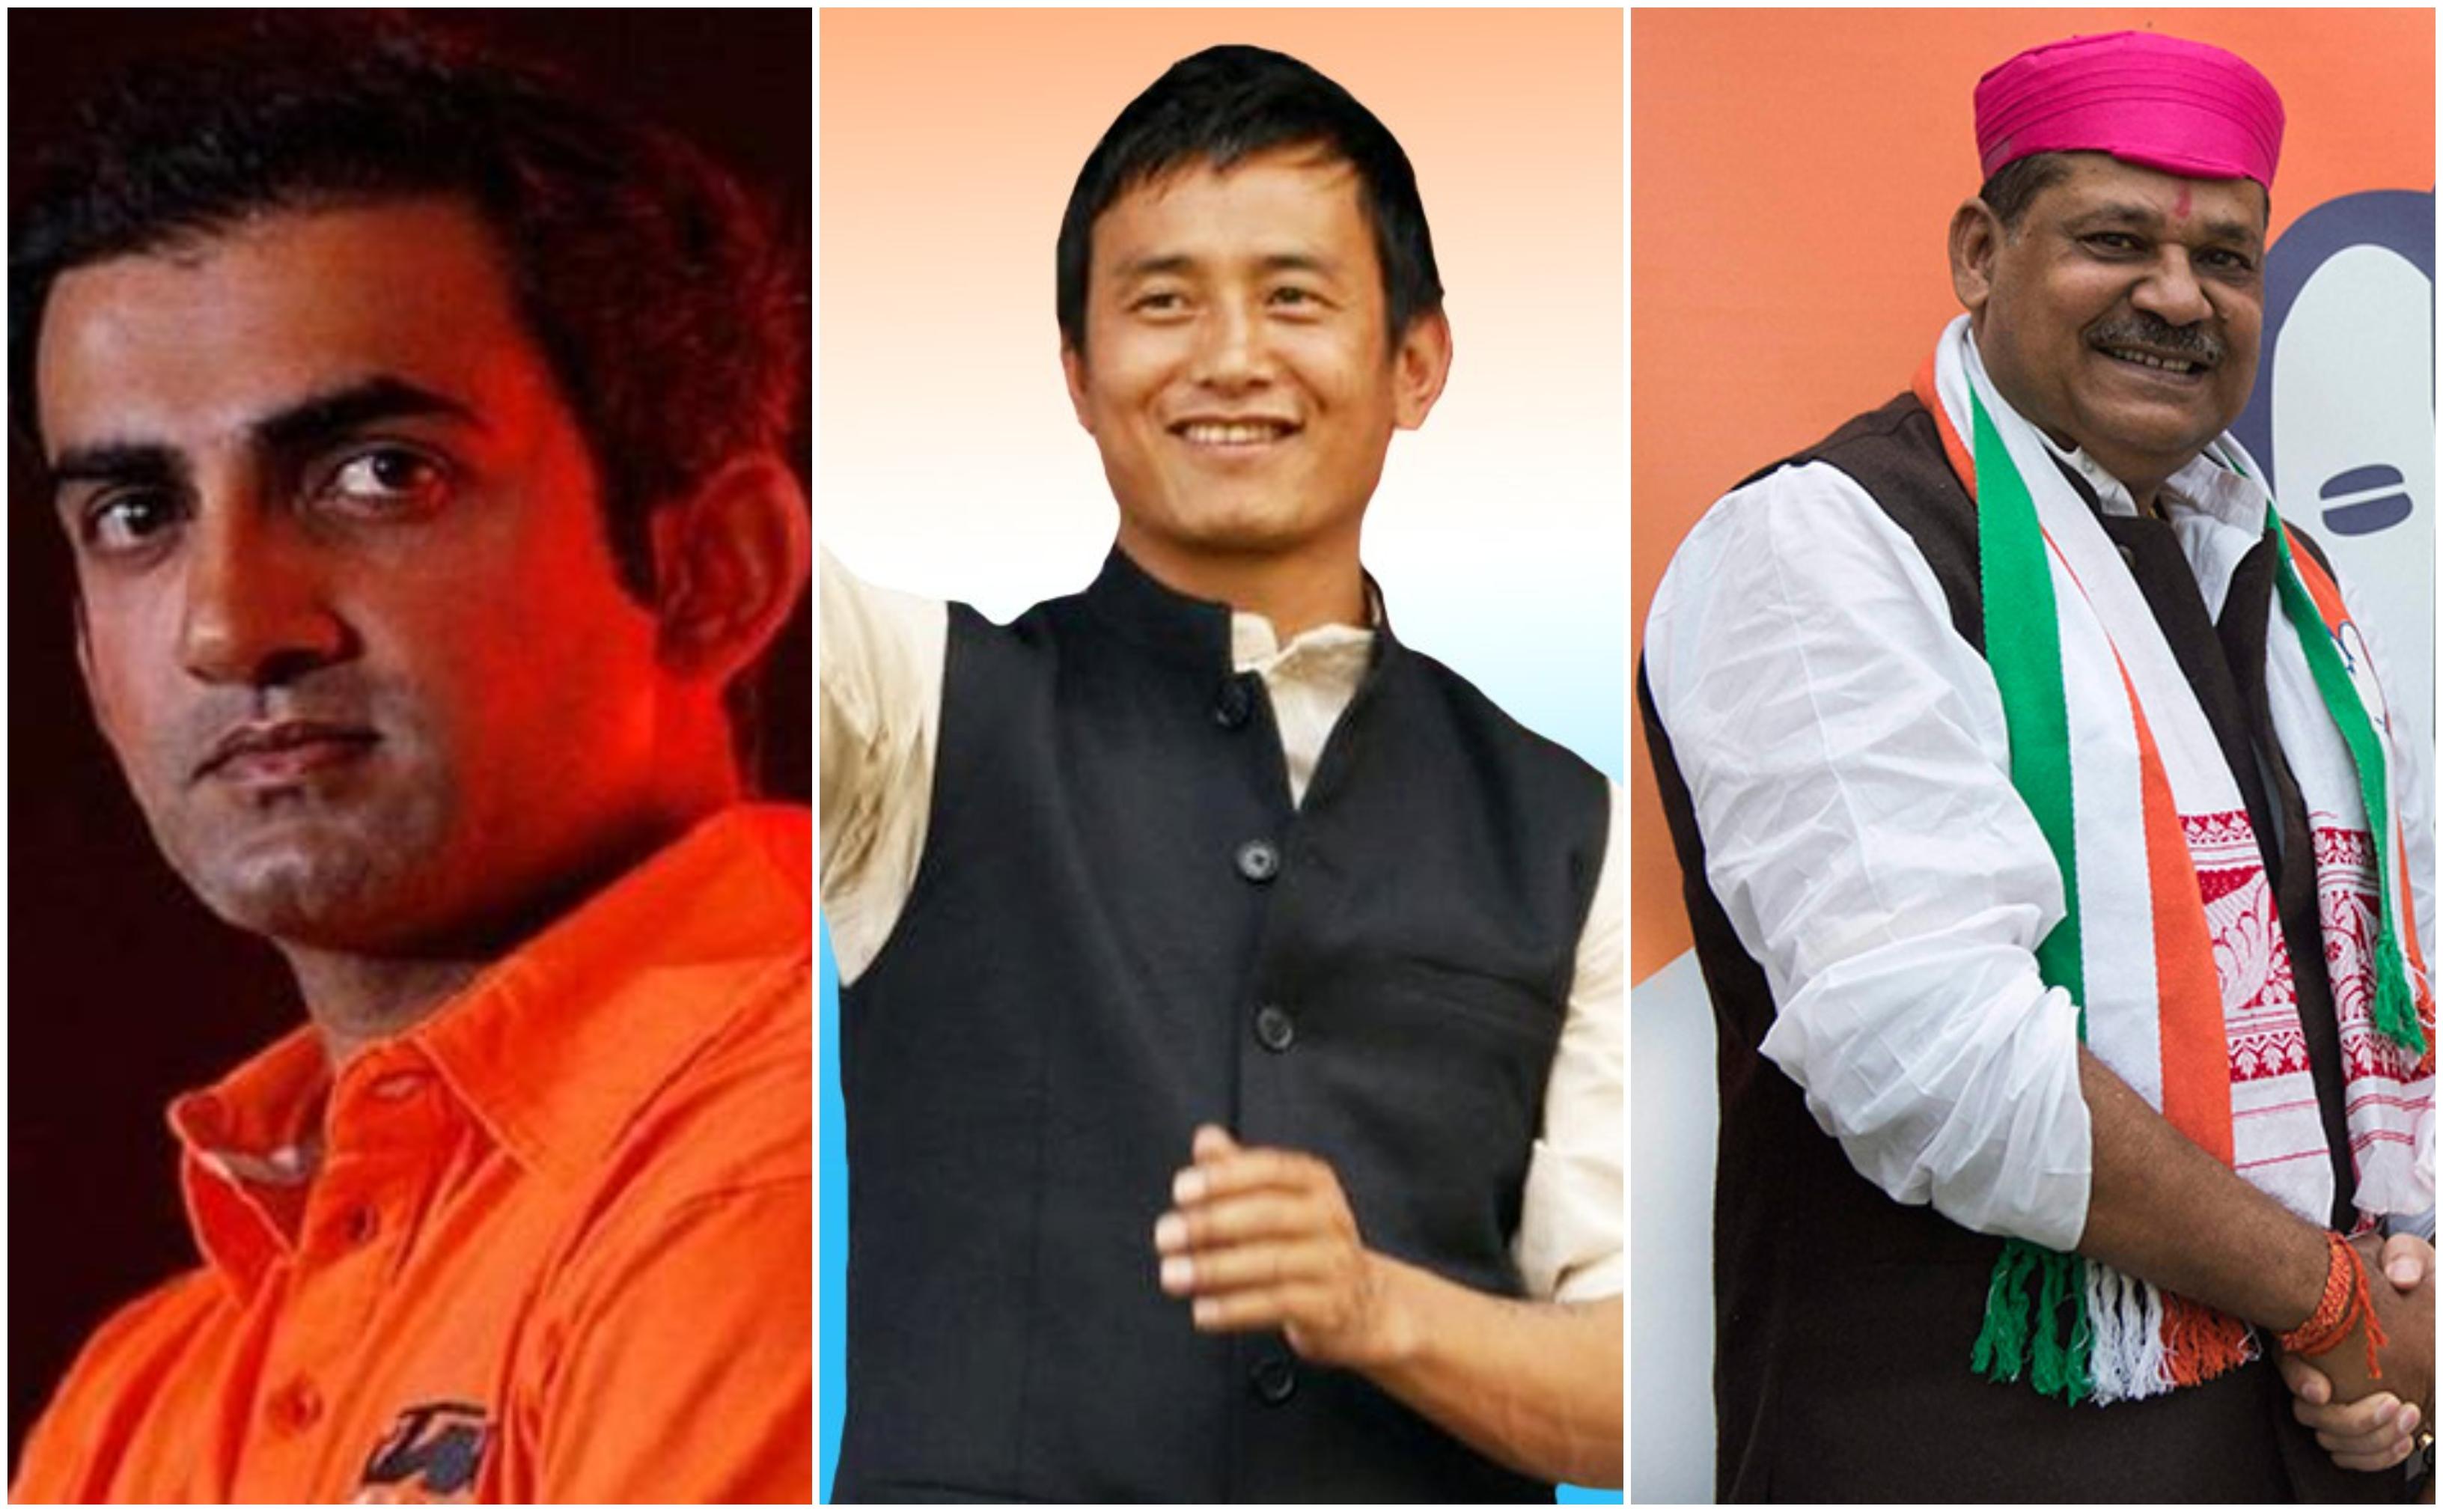 Gautam Gambhir, Bhaichung Bhutia, Navjot Singh Sidhu, Rajyavardhan Singh Rathore, Kirti Azad, Mohammad Azharuddin, Elections 2019, Battle For India, Lok Sabha Elections 2019, News Mobile India, News Mobile India